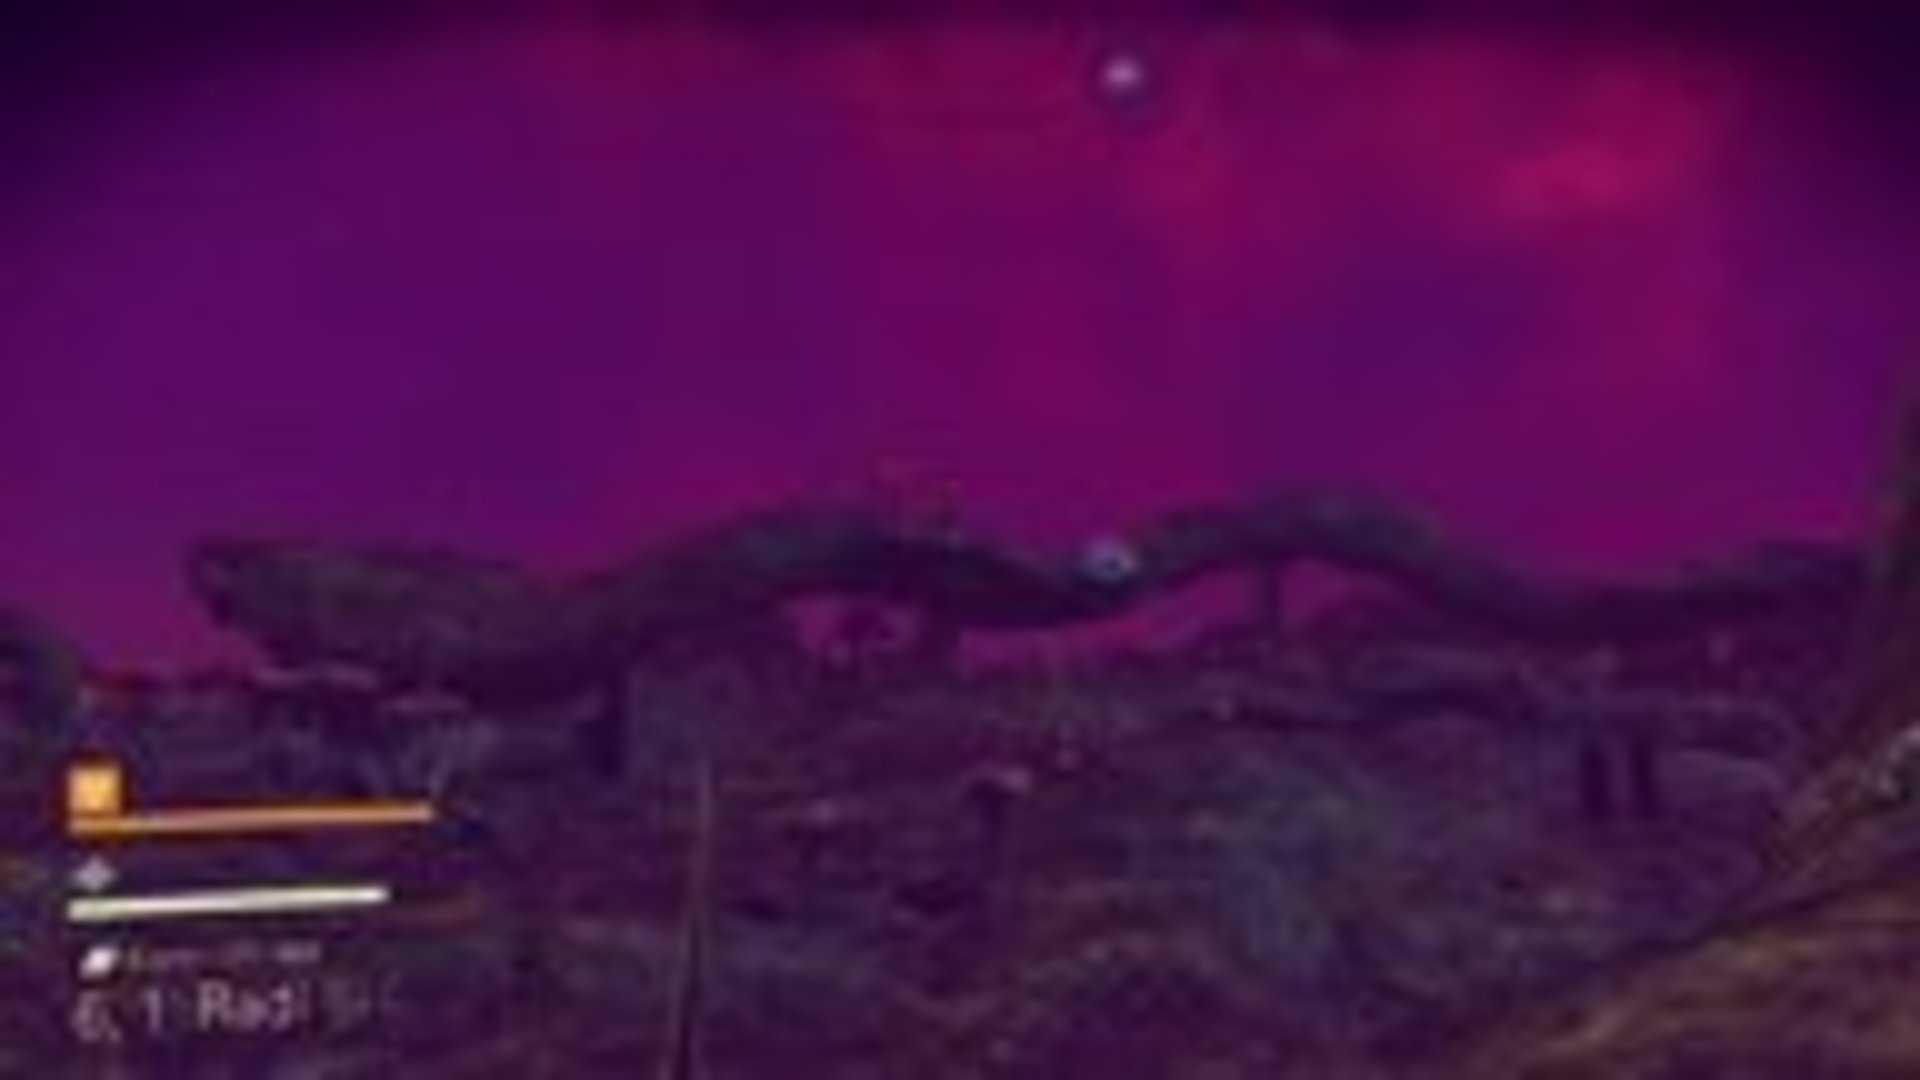 「Konnichiwa星」とりあえず初めの星なので記念に名前をつけた。放射能ガンガンの荒廃した星。/『No Man's Sky』スクリーンショット